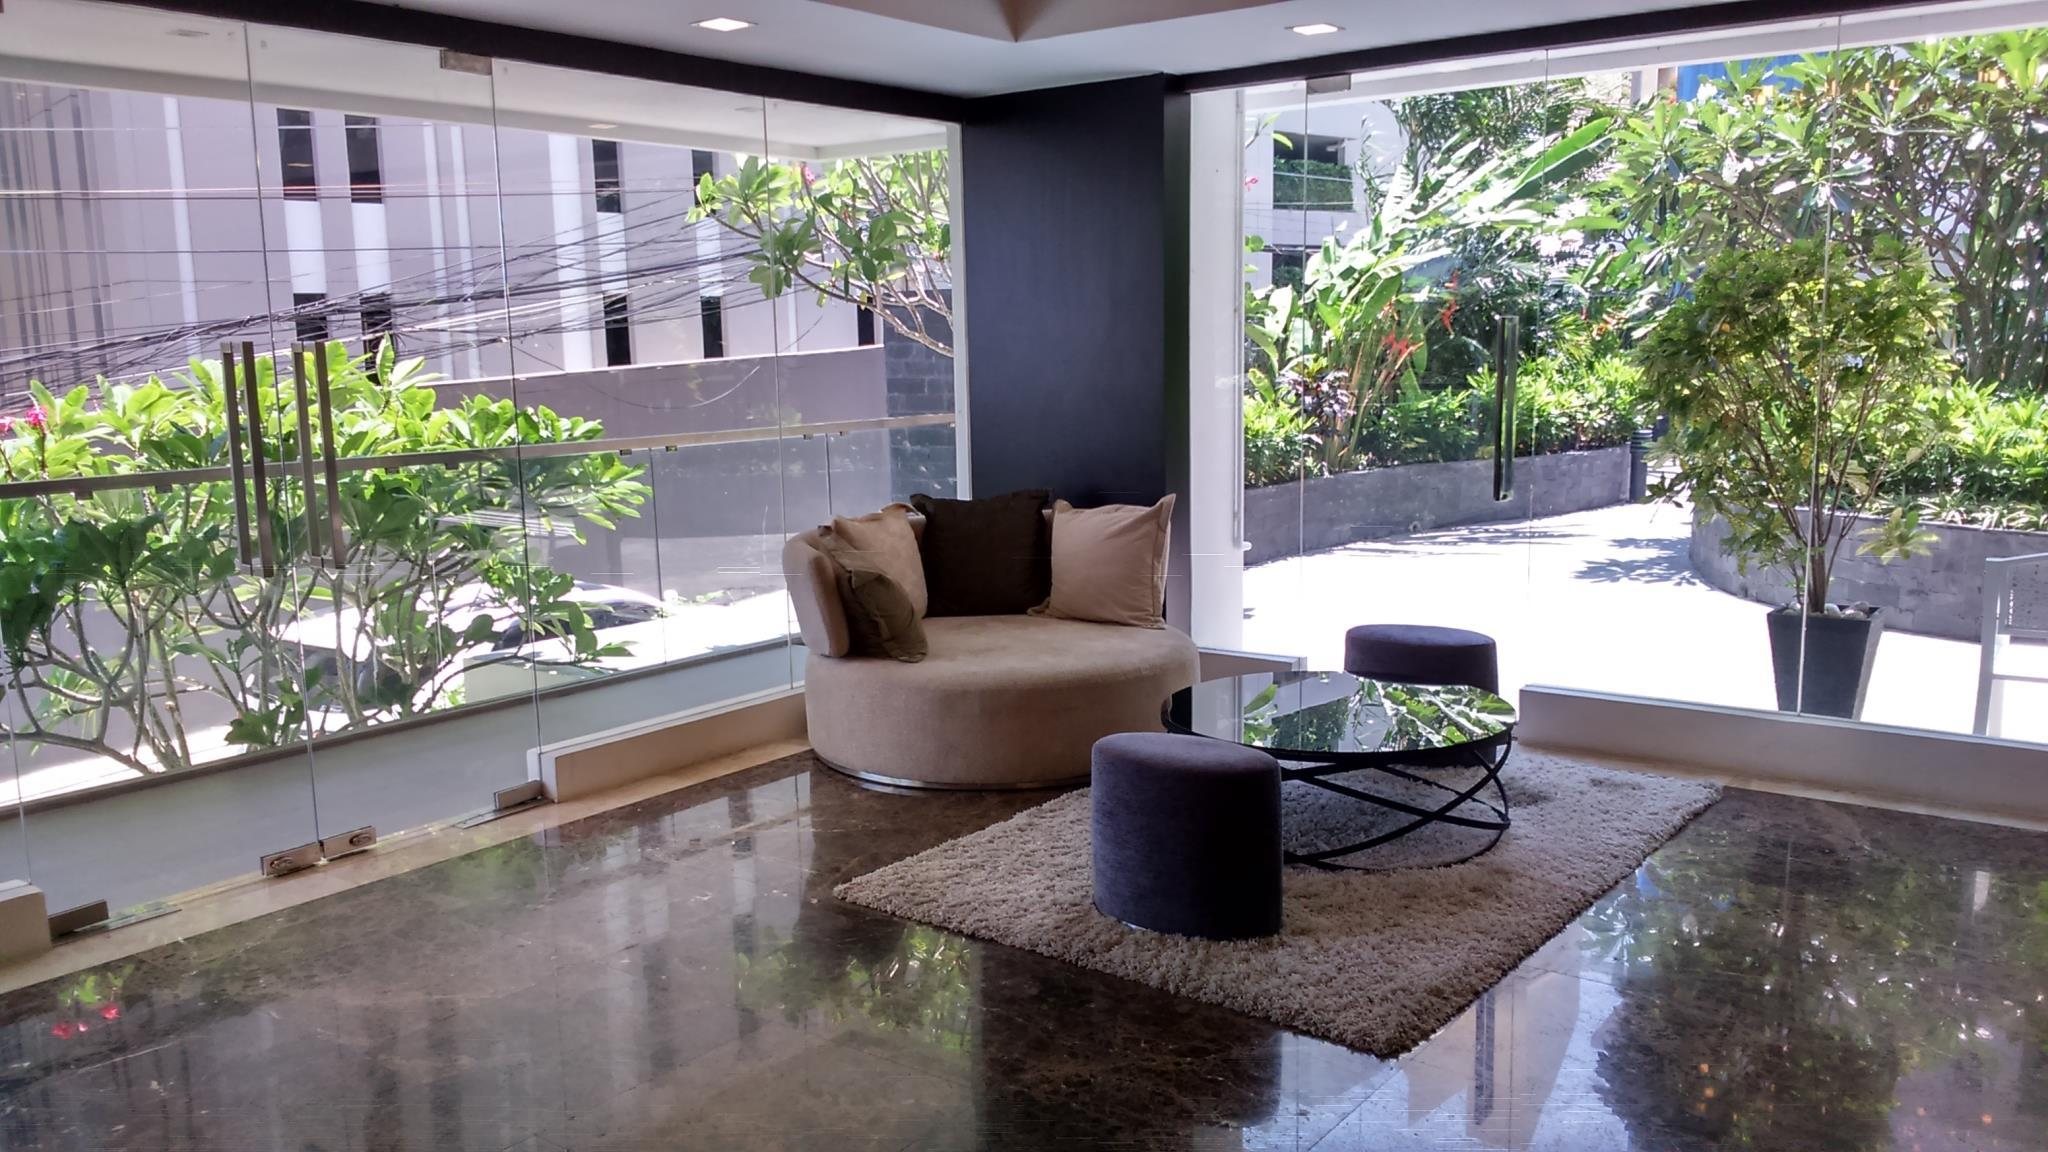 Serenity Wongamat Condominium Studio by Harj,Serenity Wongamat Condominium Studio by Harj